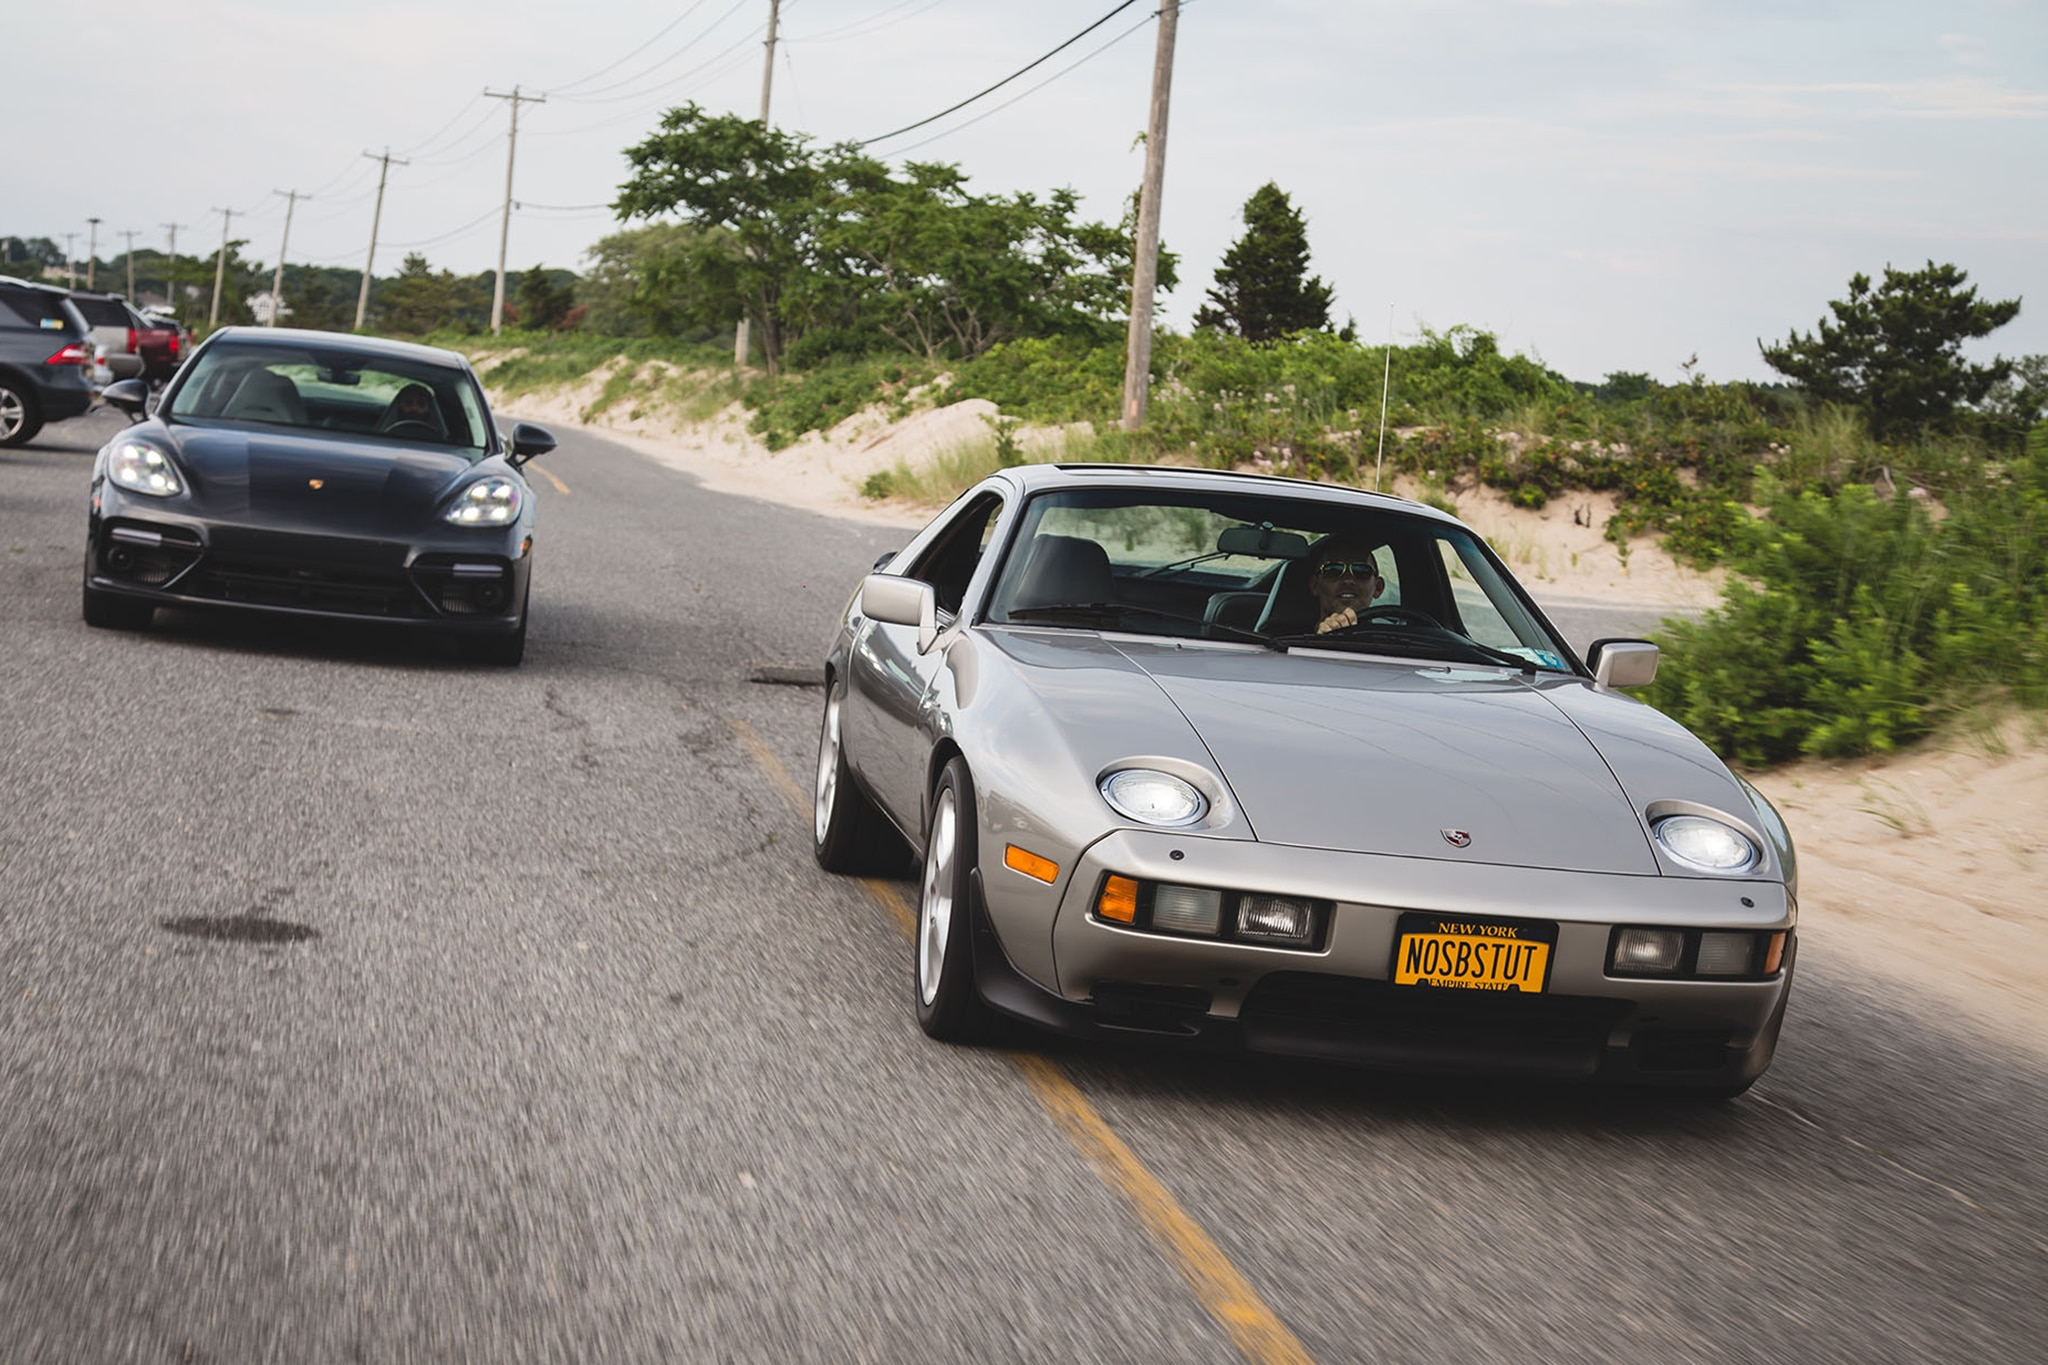 1982 Porsche 928 Meets 2017 Porsche Panamera Turbo | Automobile Magazine